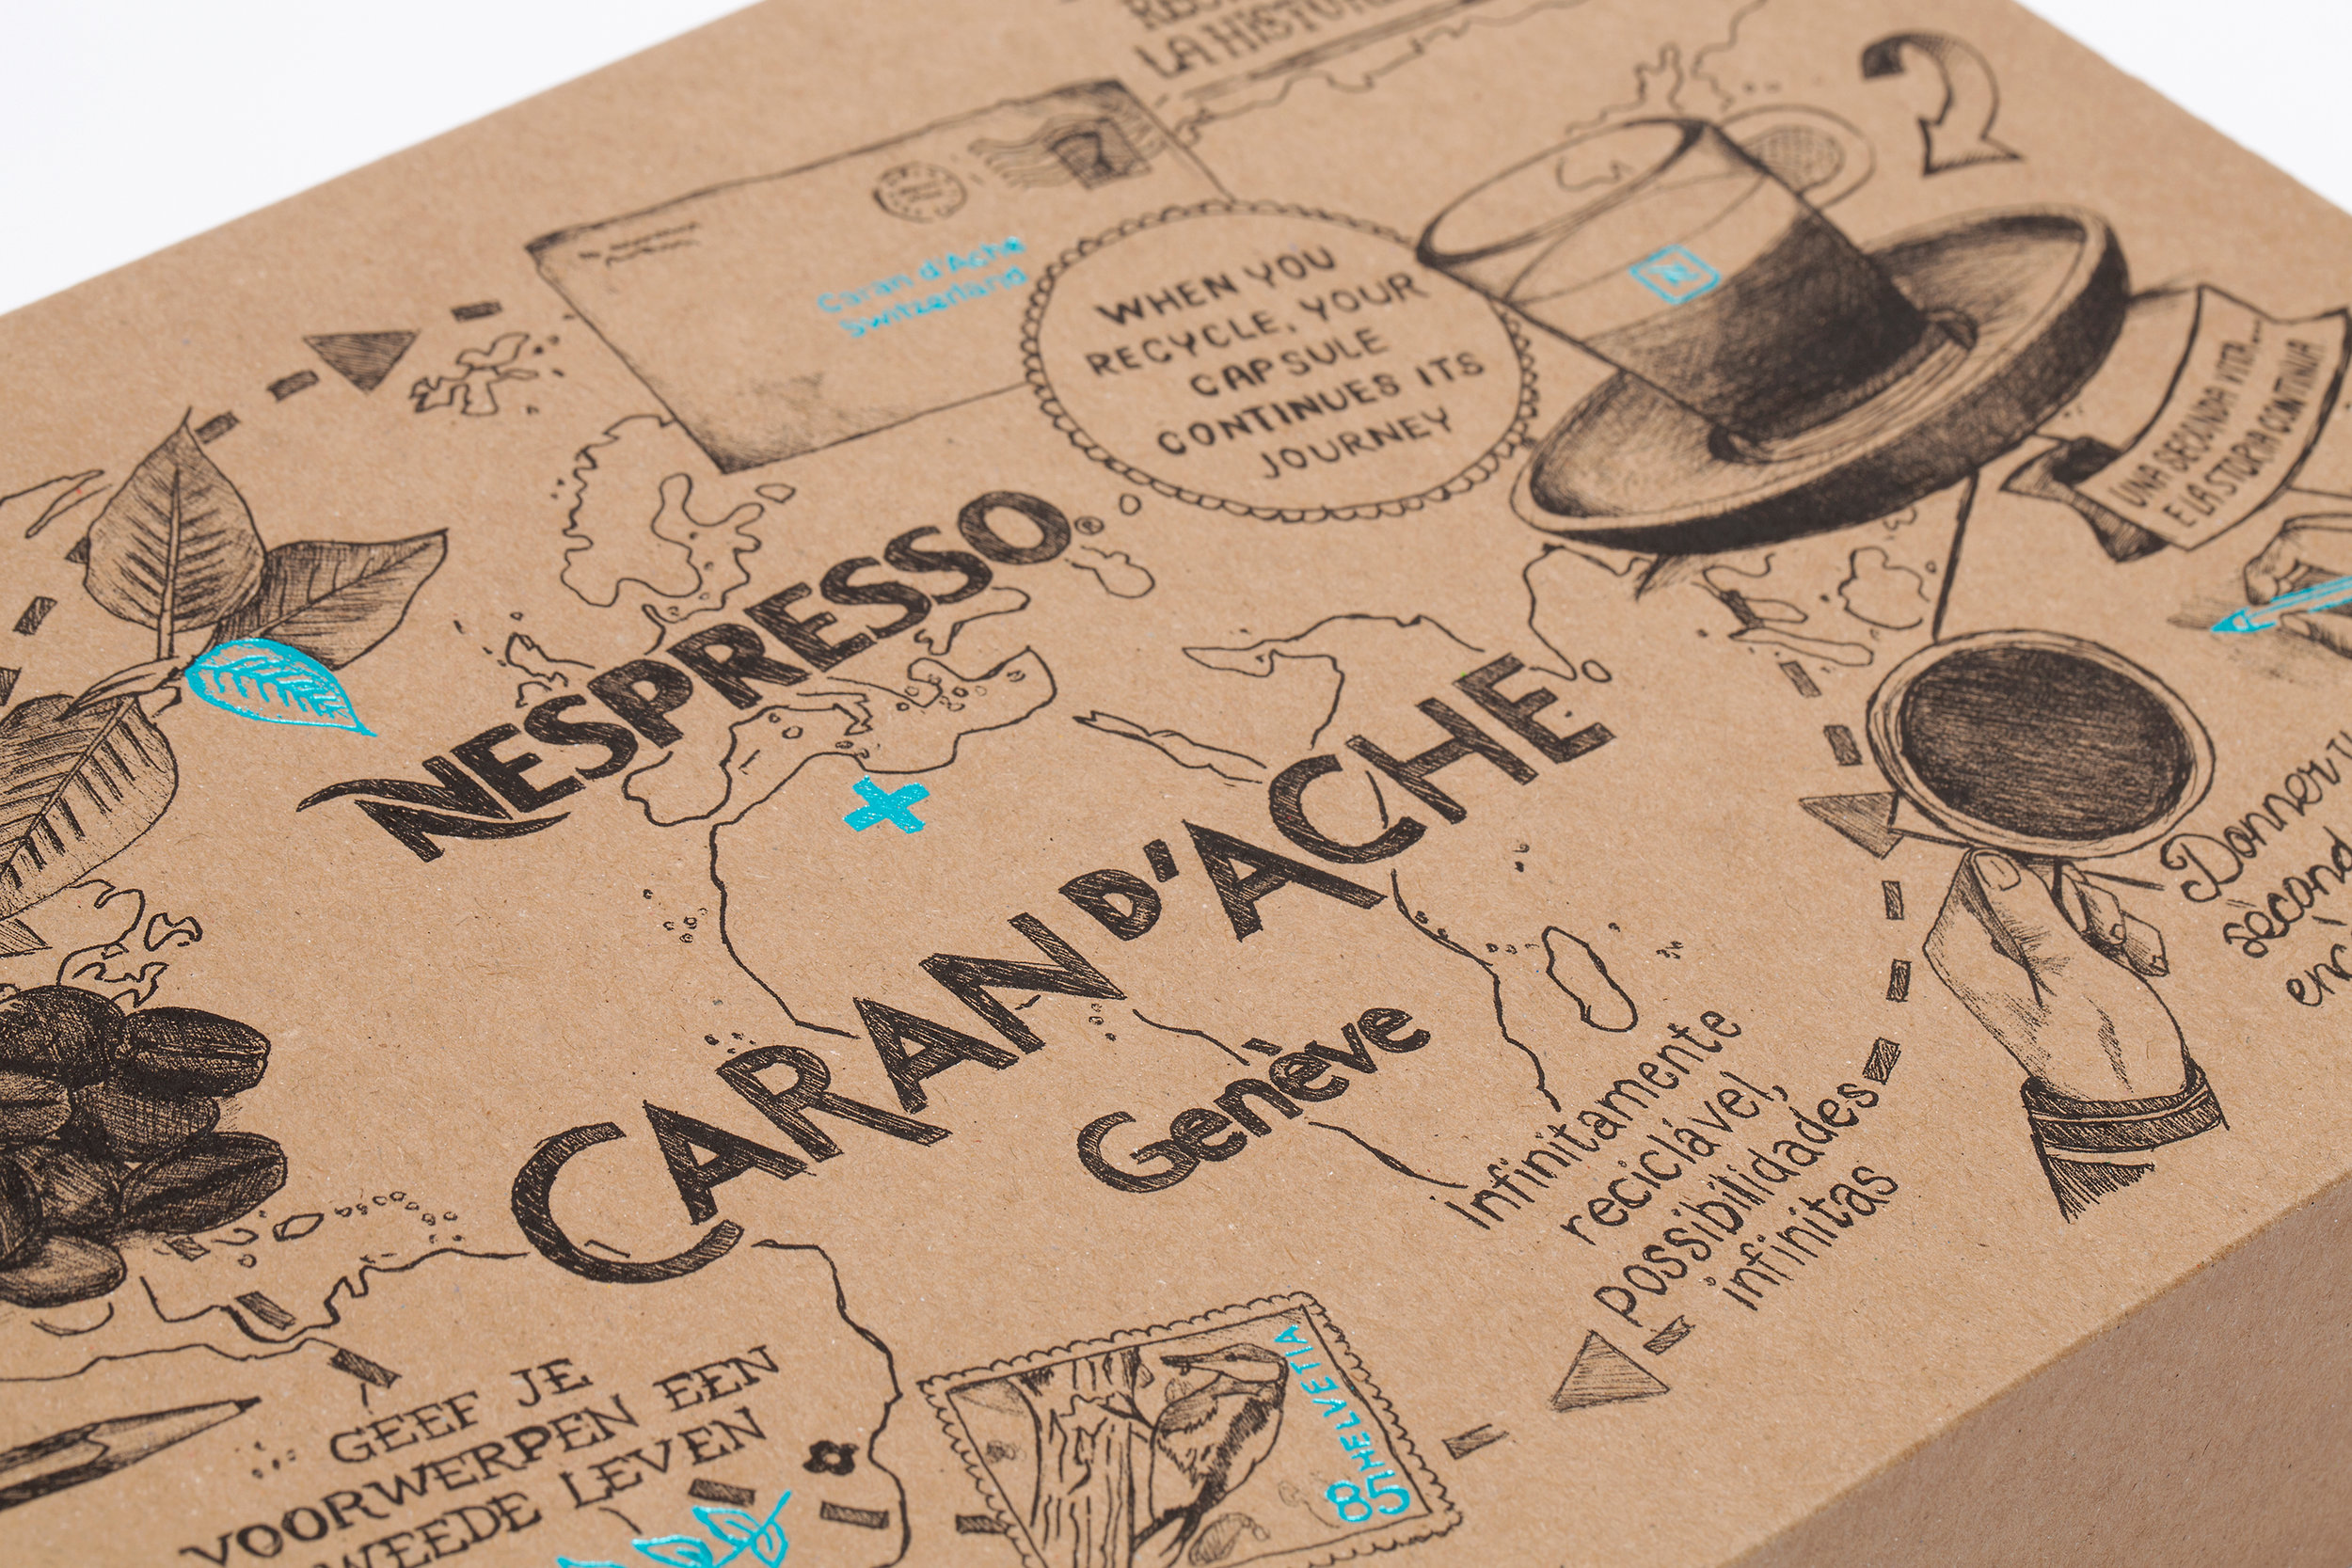 nespresso_carandache_box_4.jpg